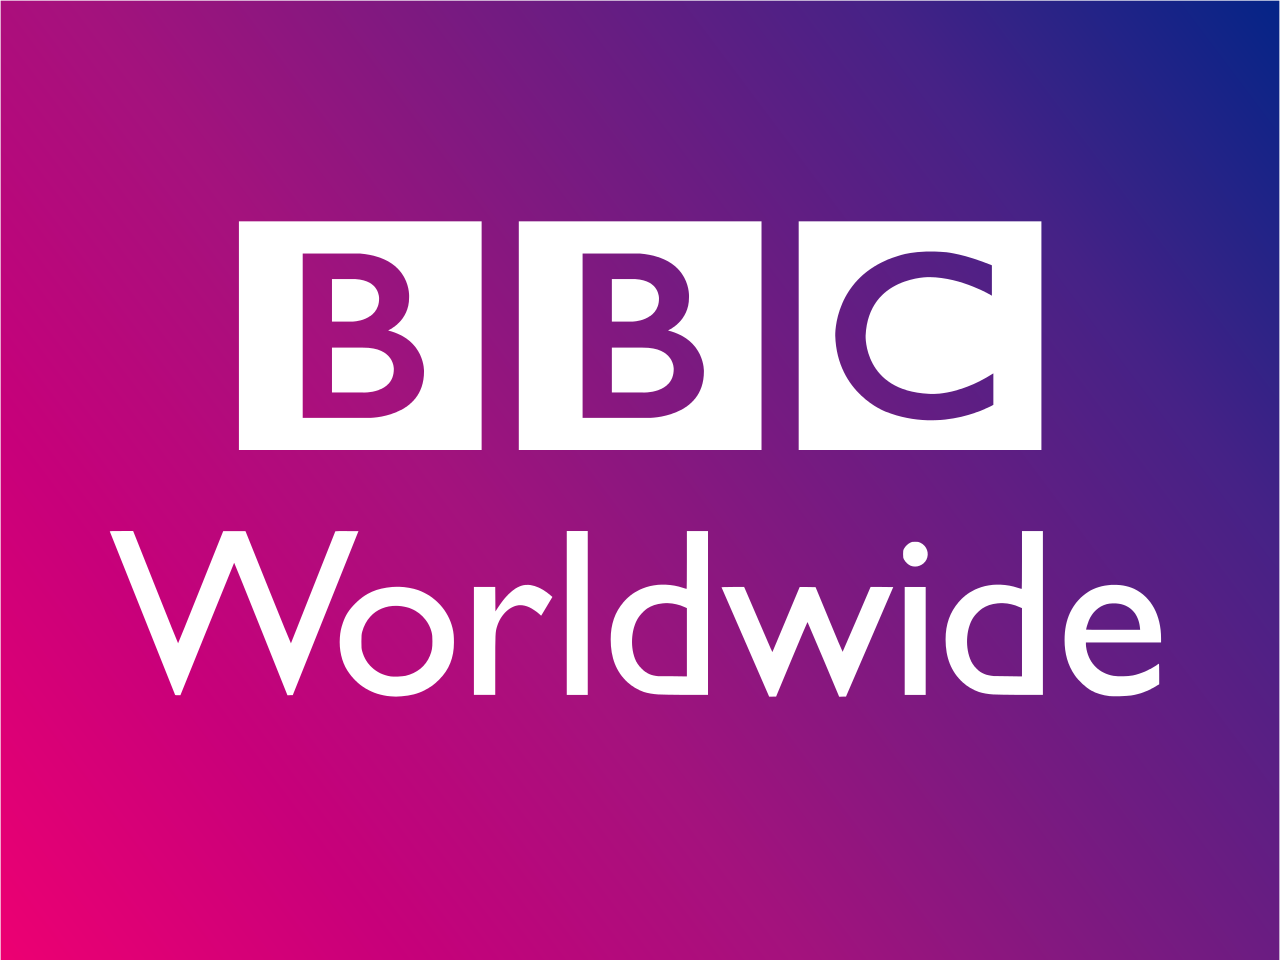 BBC_Worldwide_Logo.png